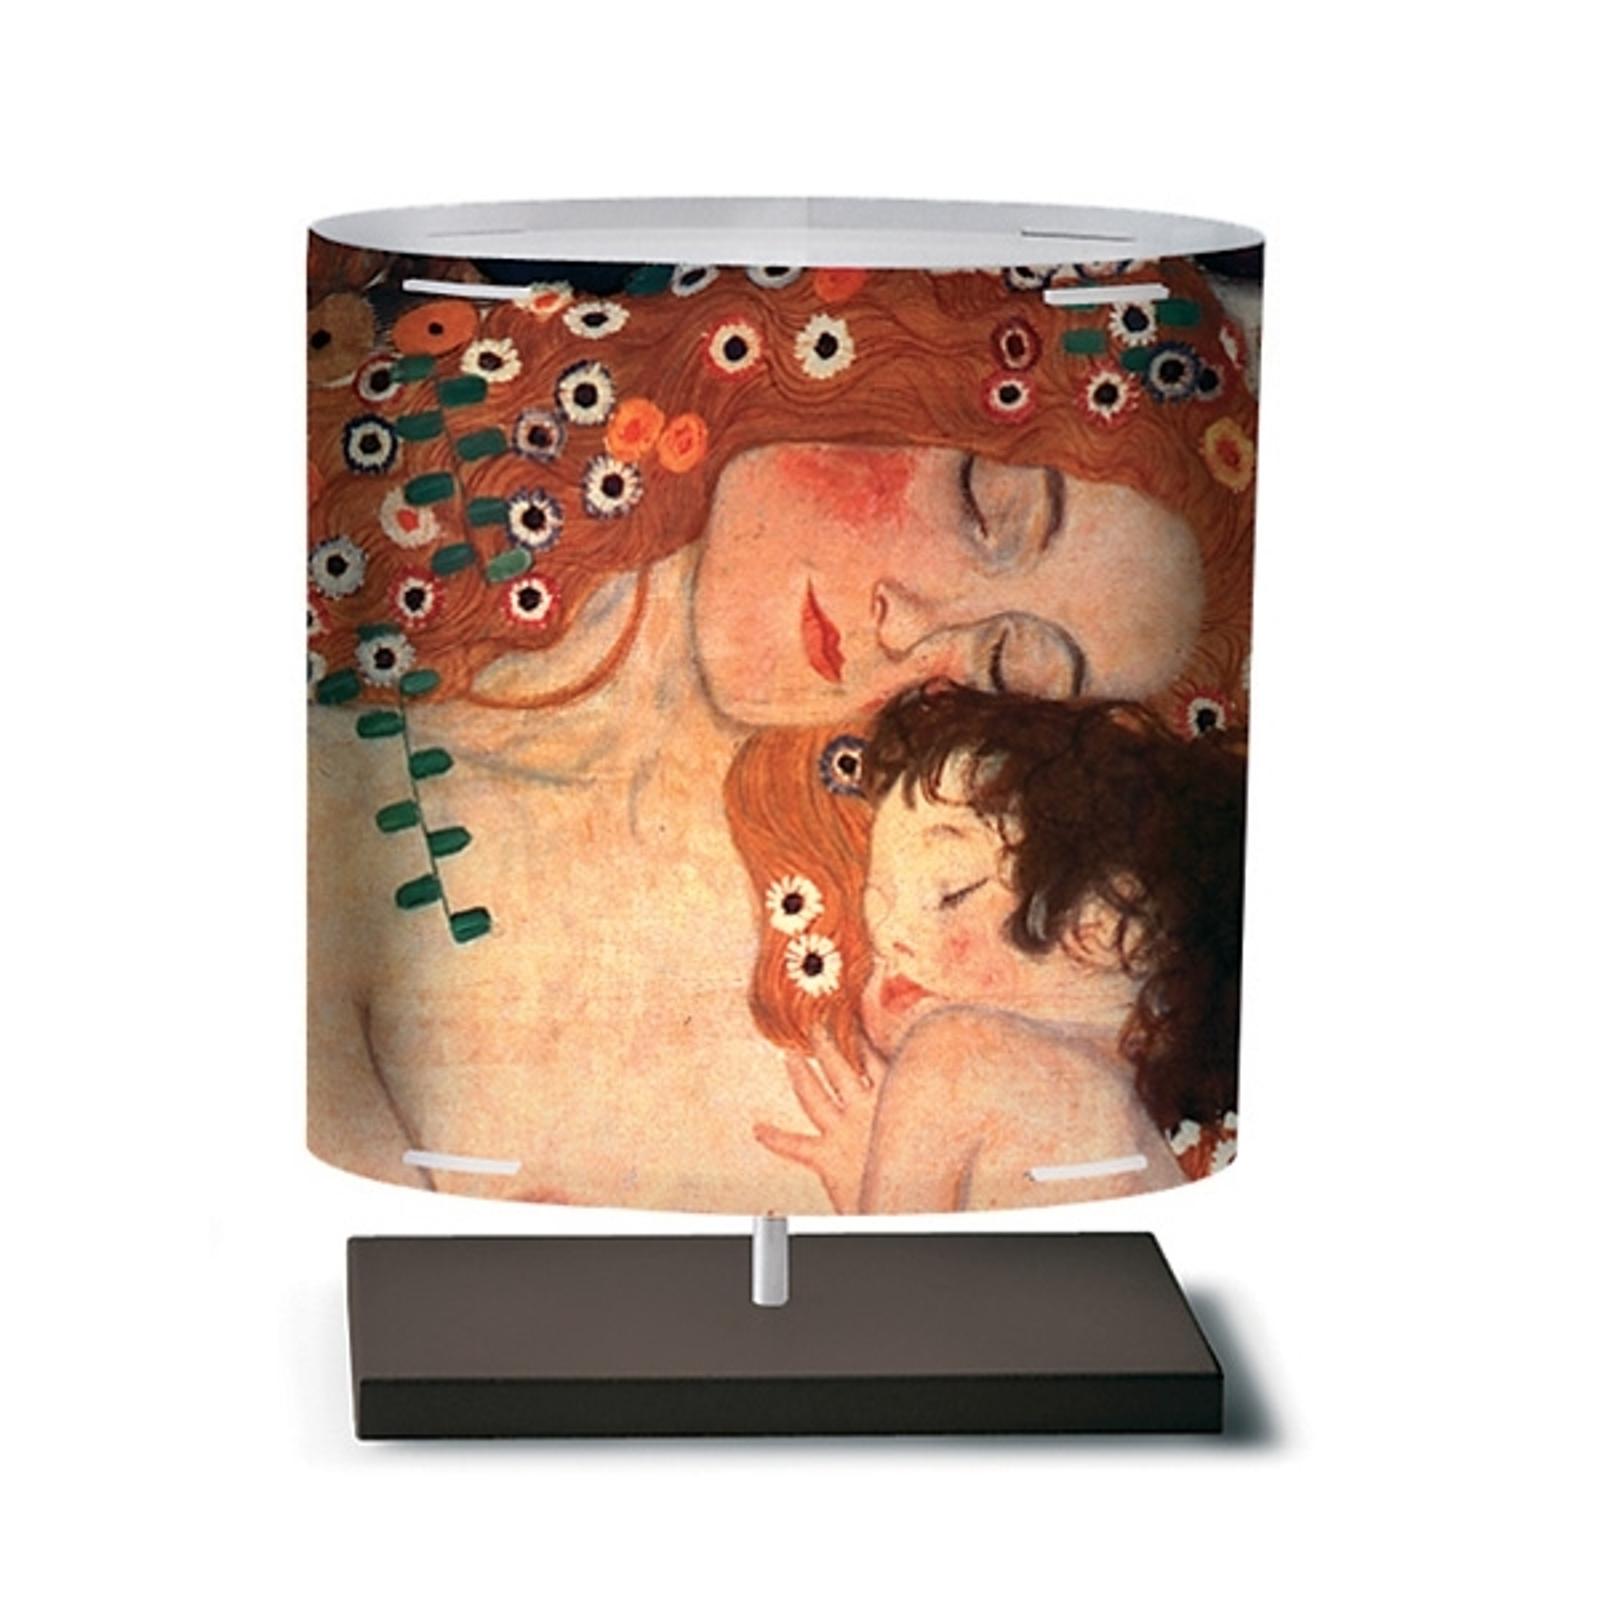 Klimt II - table lamp with art motif_1056046_1